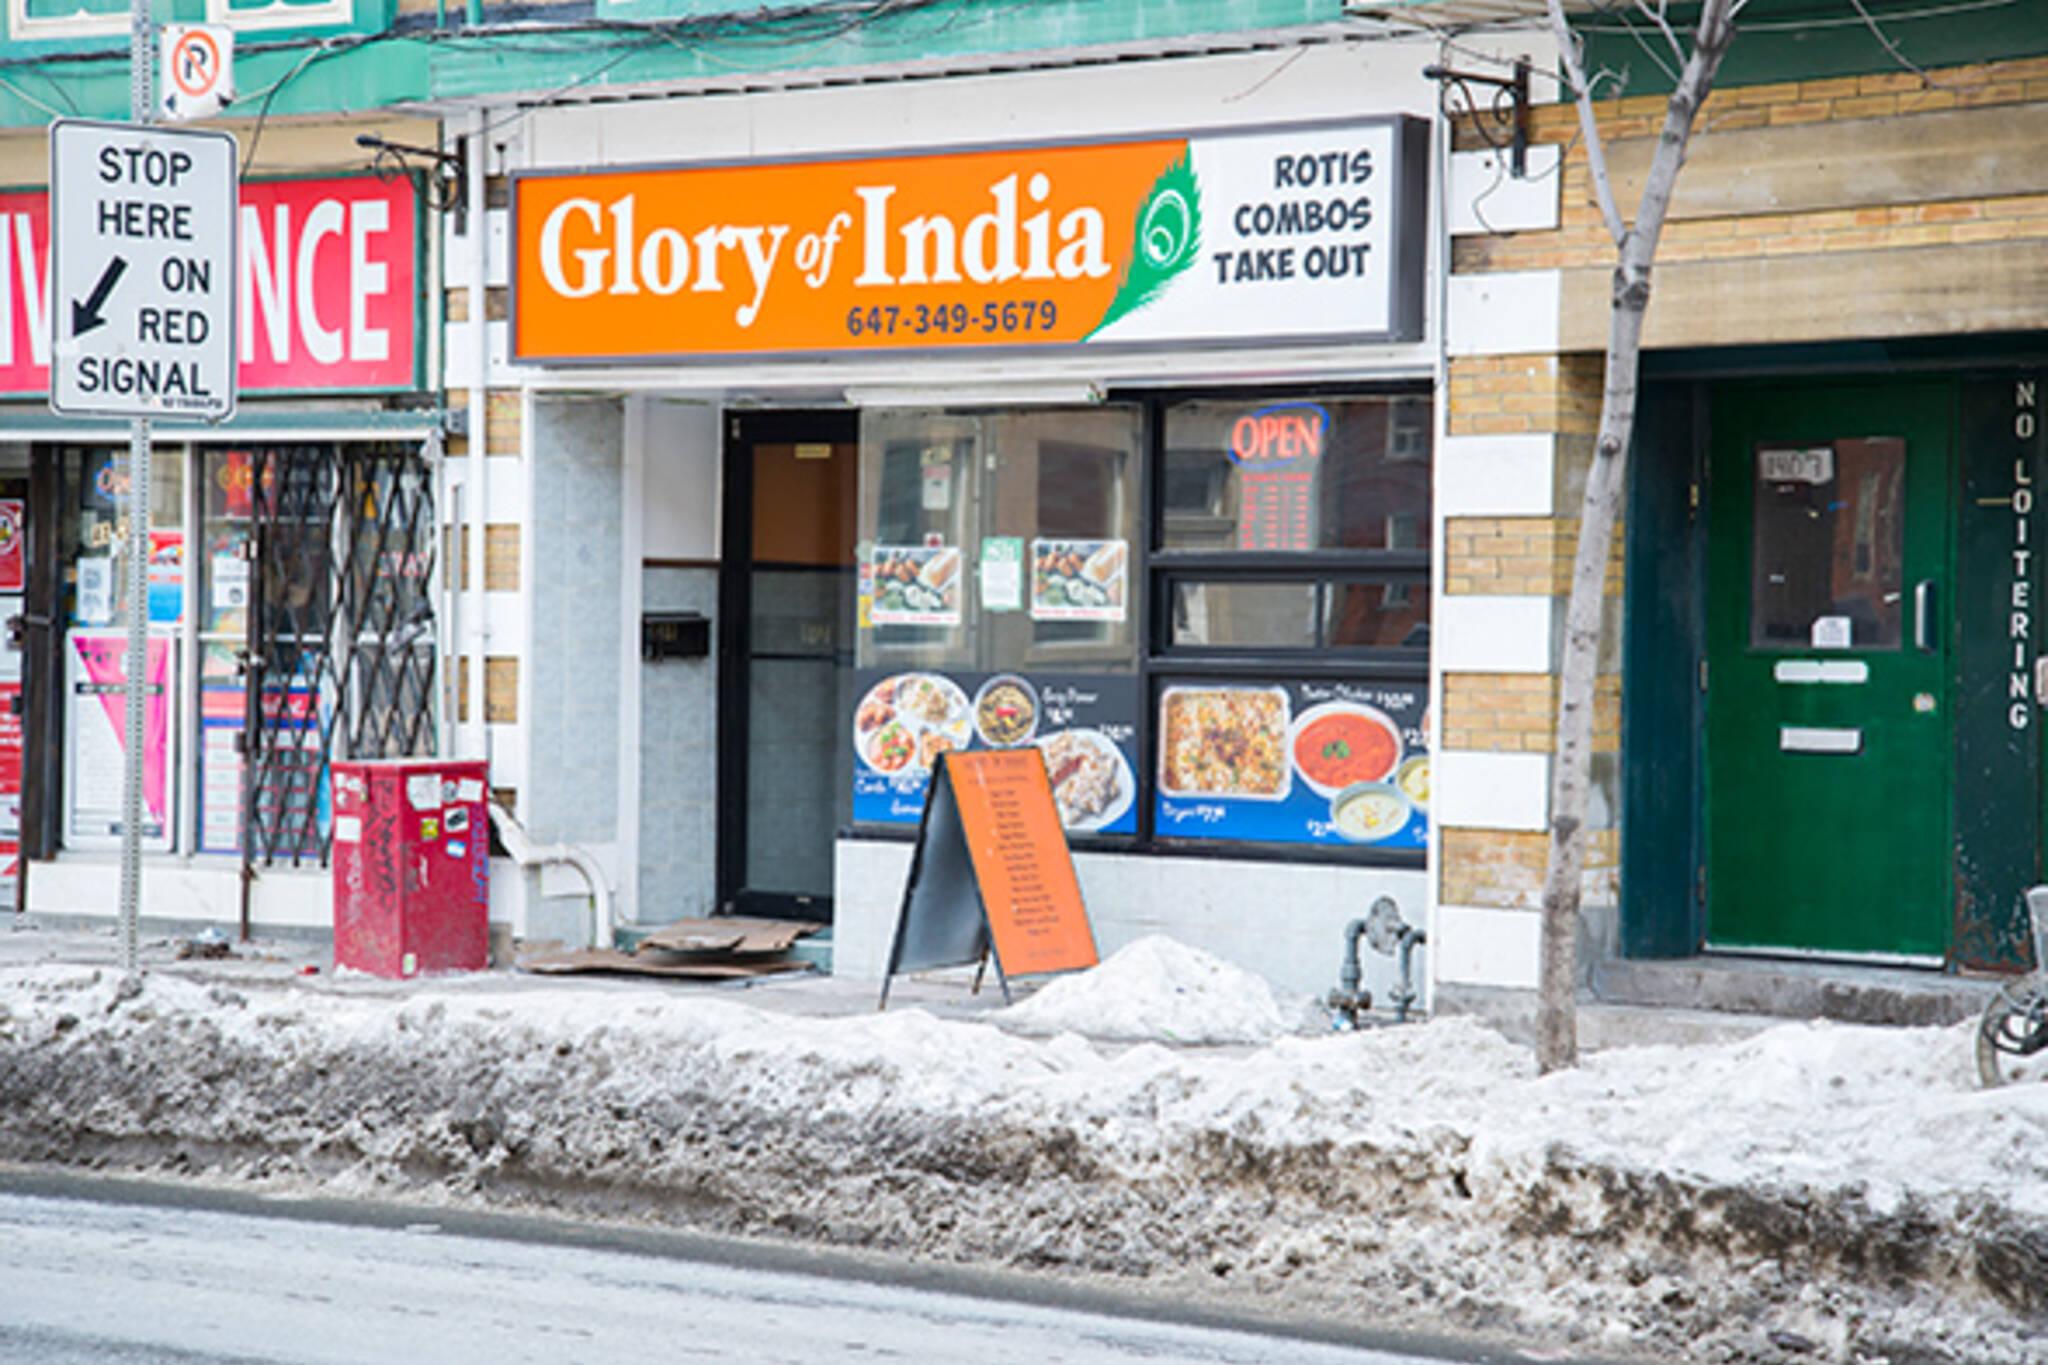 Glory of India